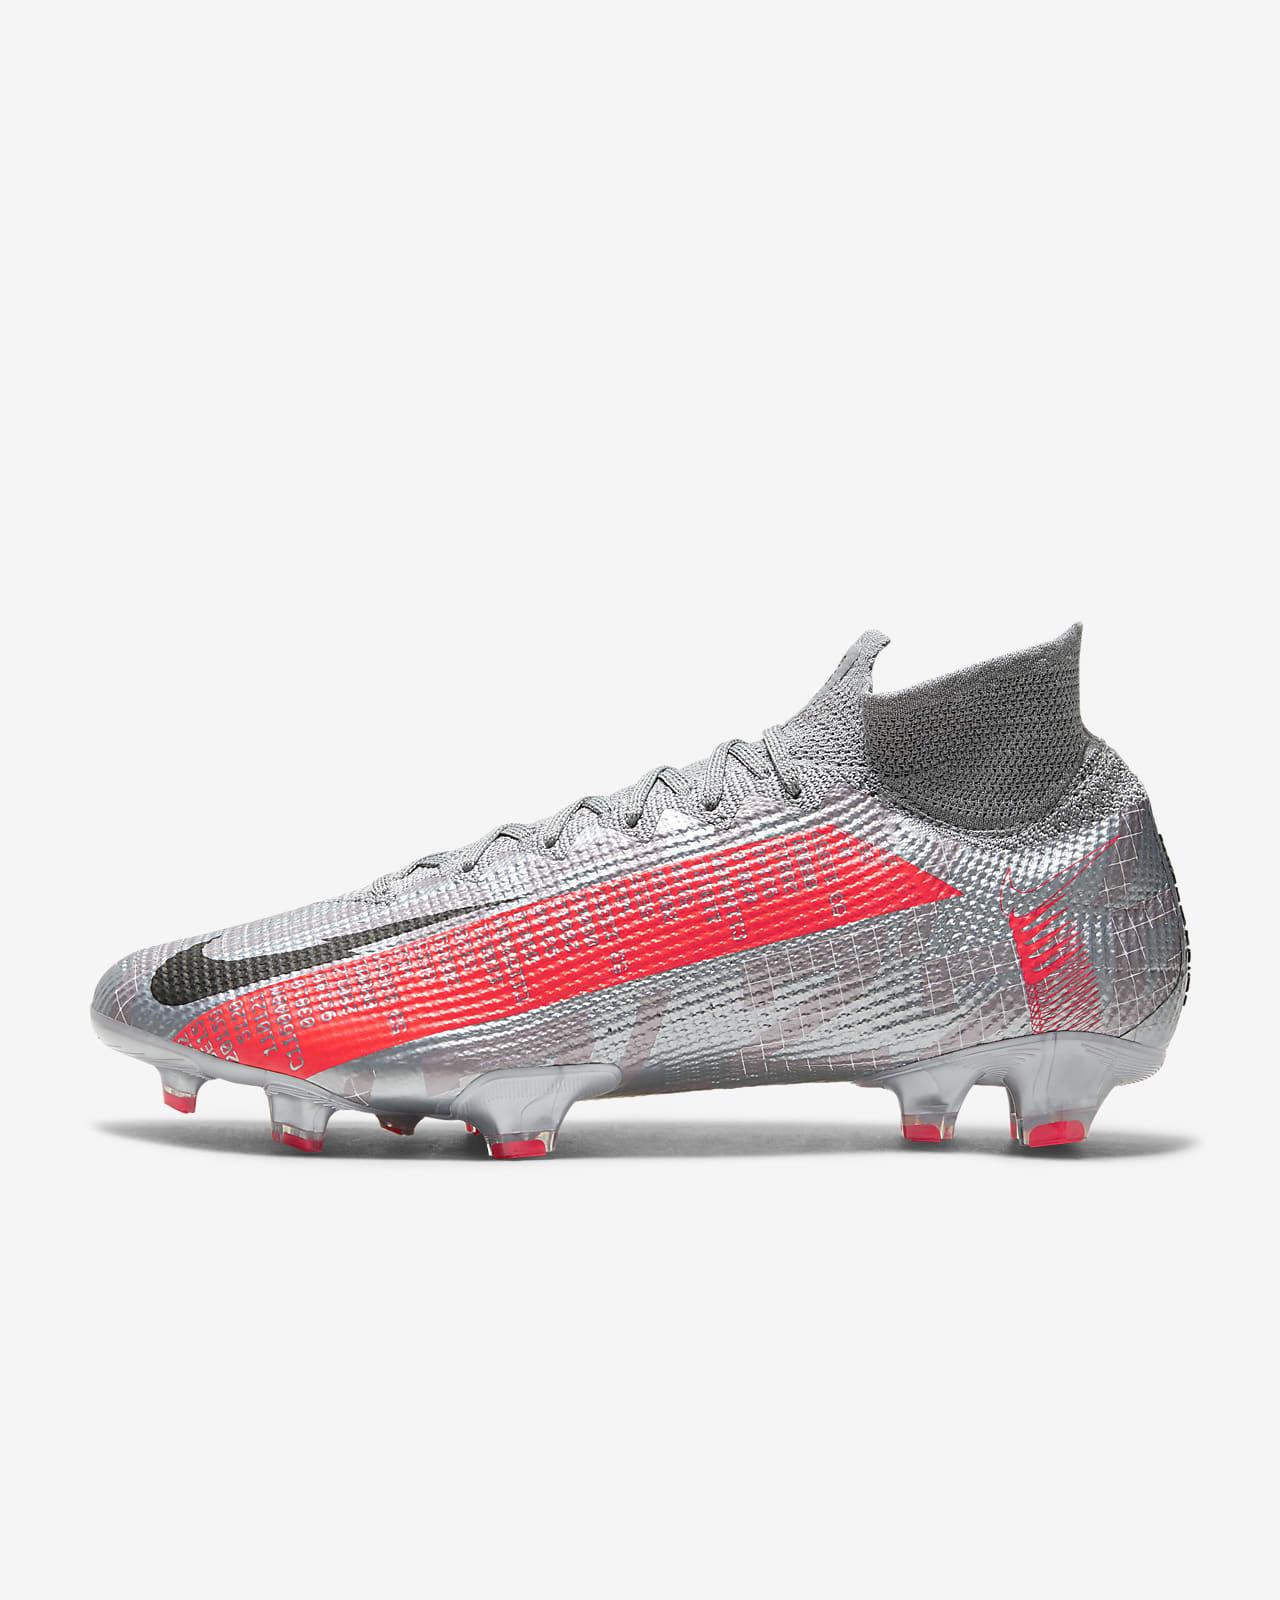 cojo Consejo Generacion  Nike Mercurial Superfly 7 Elite FG Firm-Ground Football Boot. Nike MY